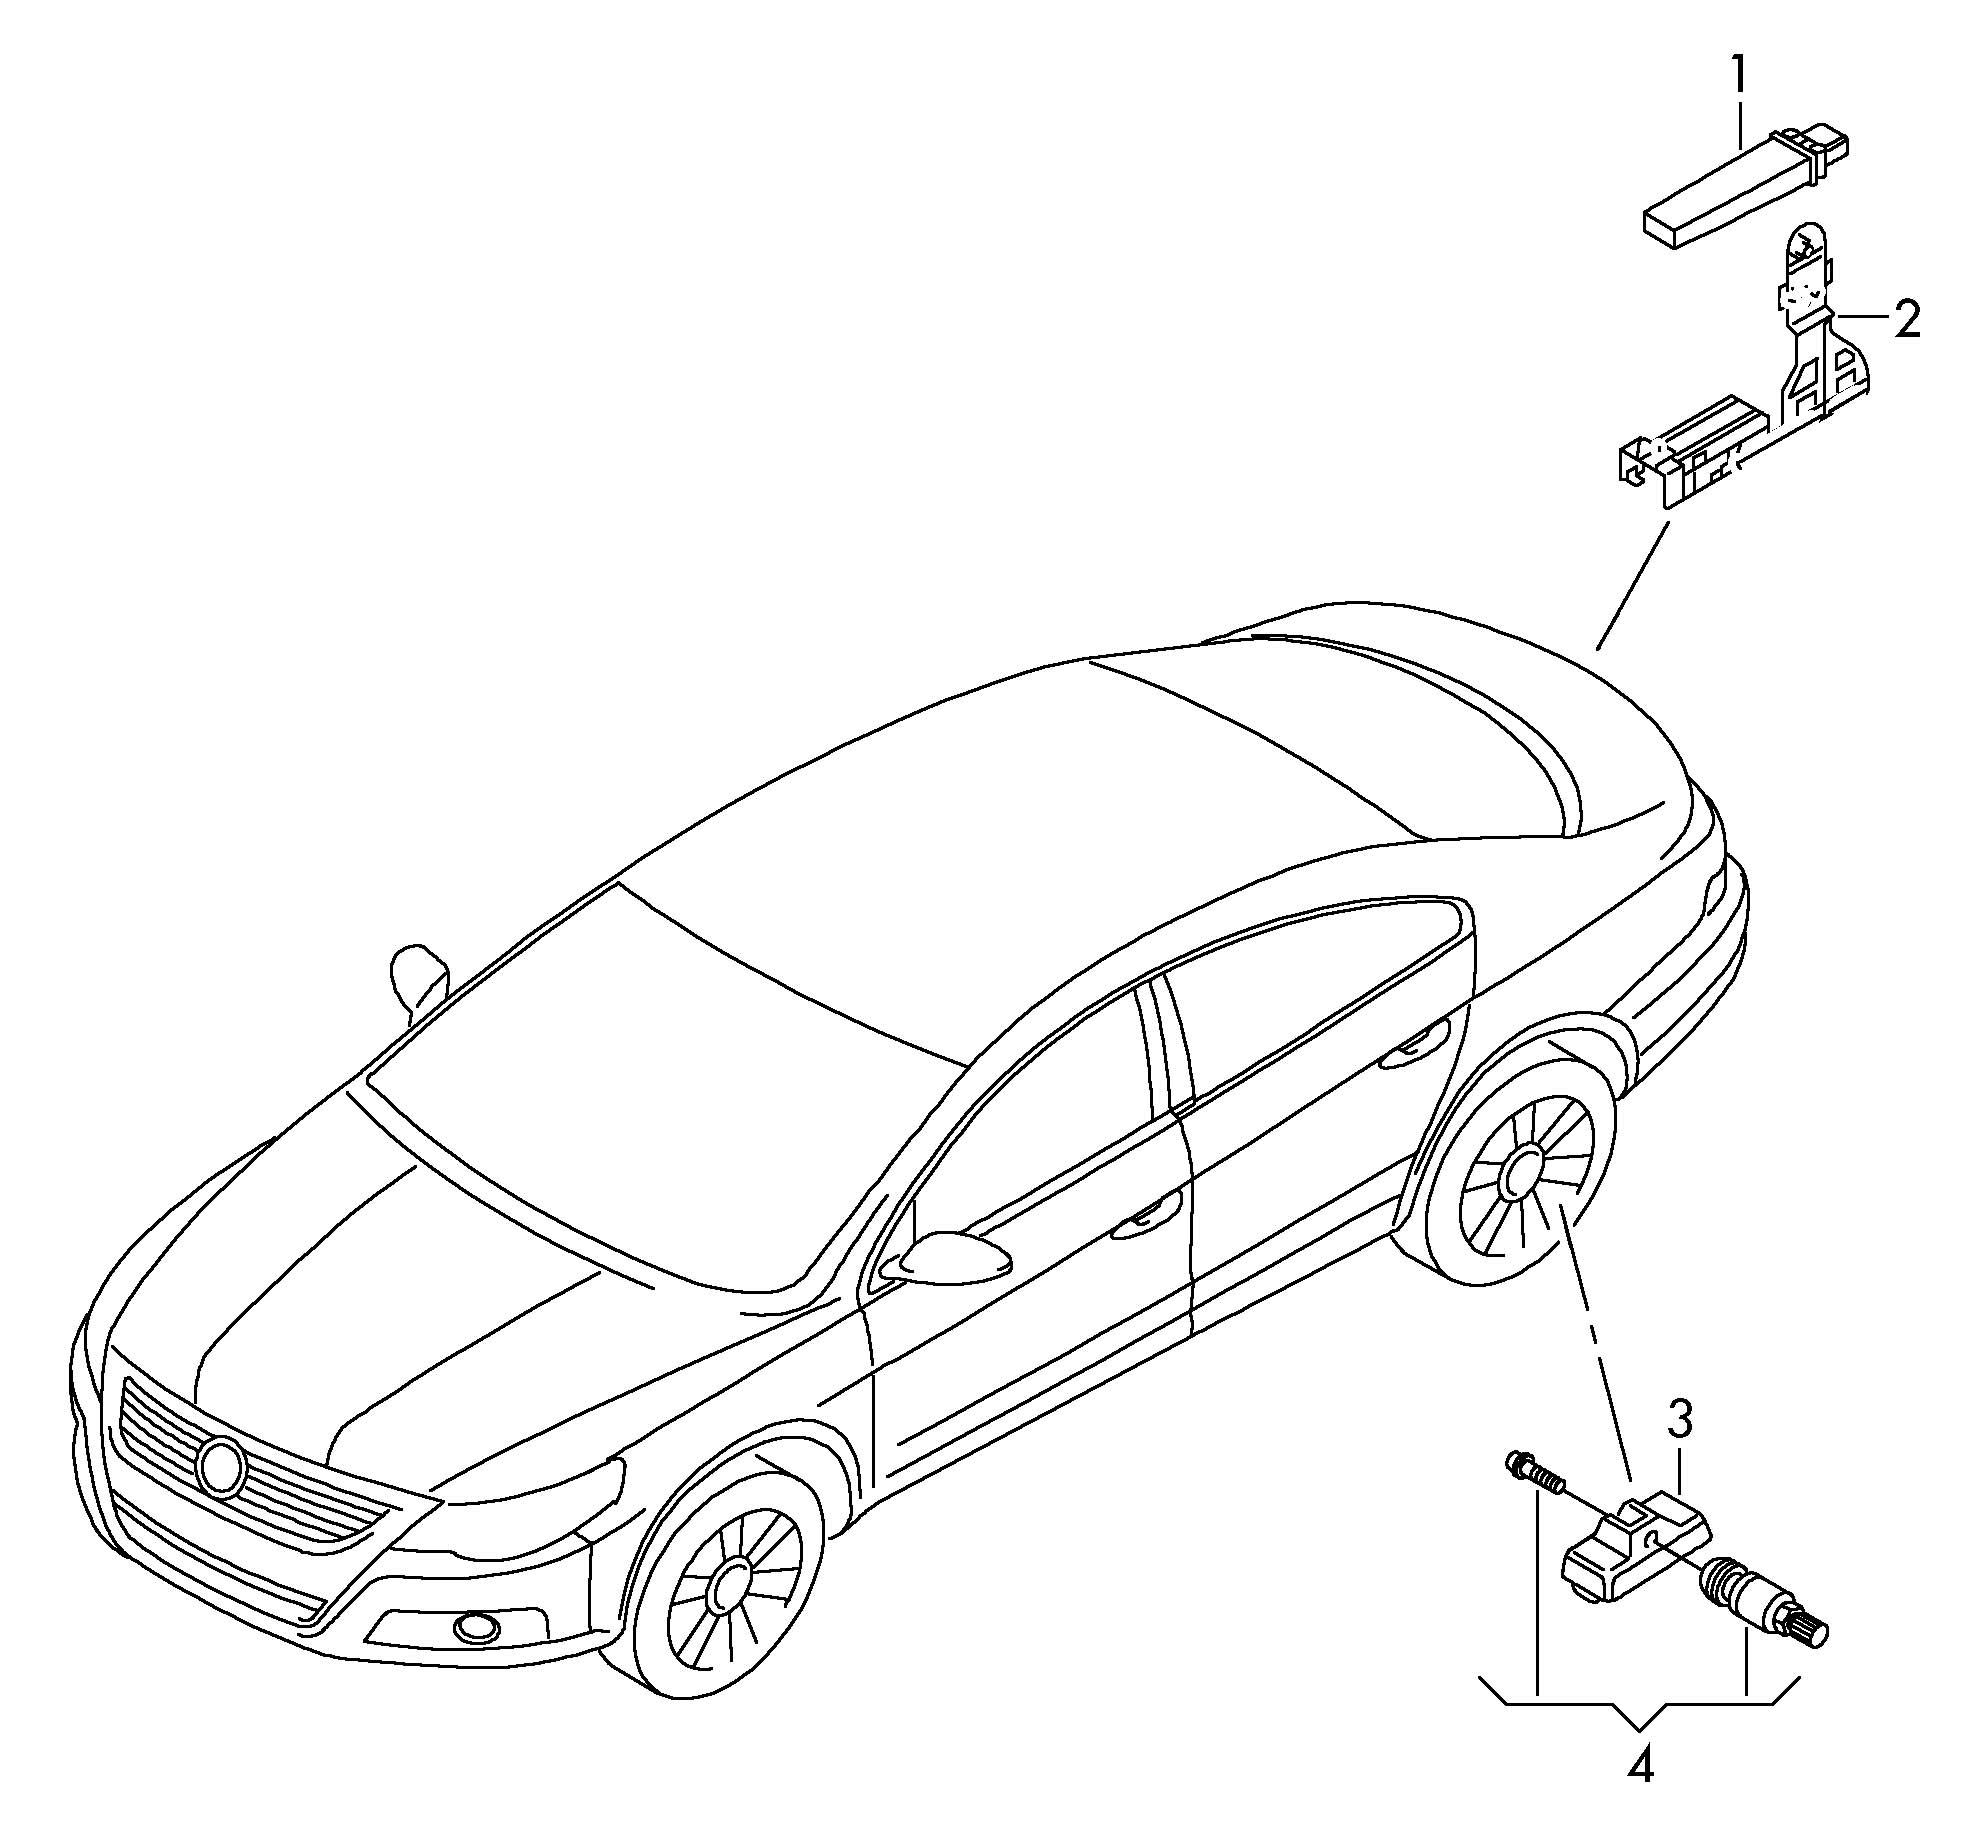 Volkswagen Passat CC Tire pressure control system